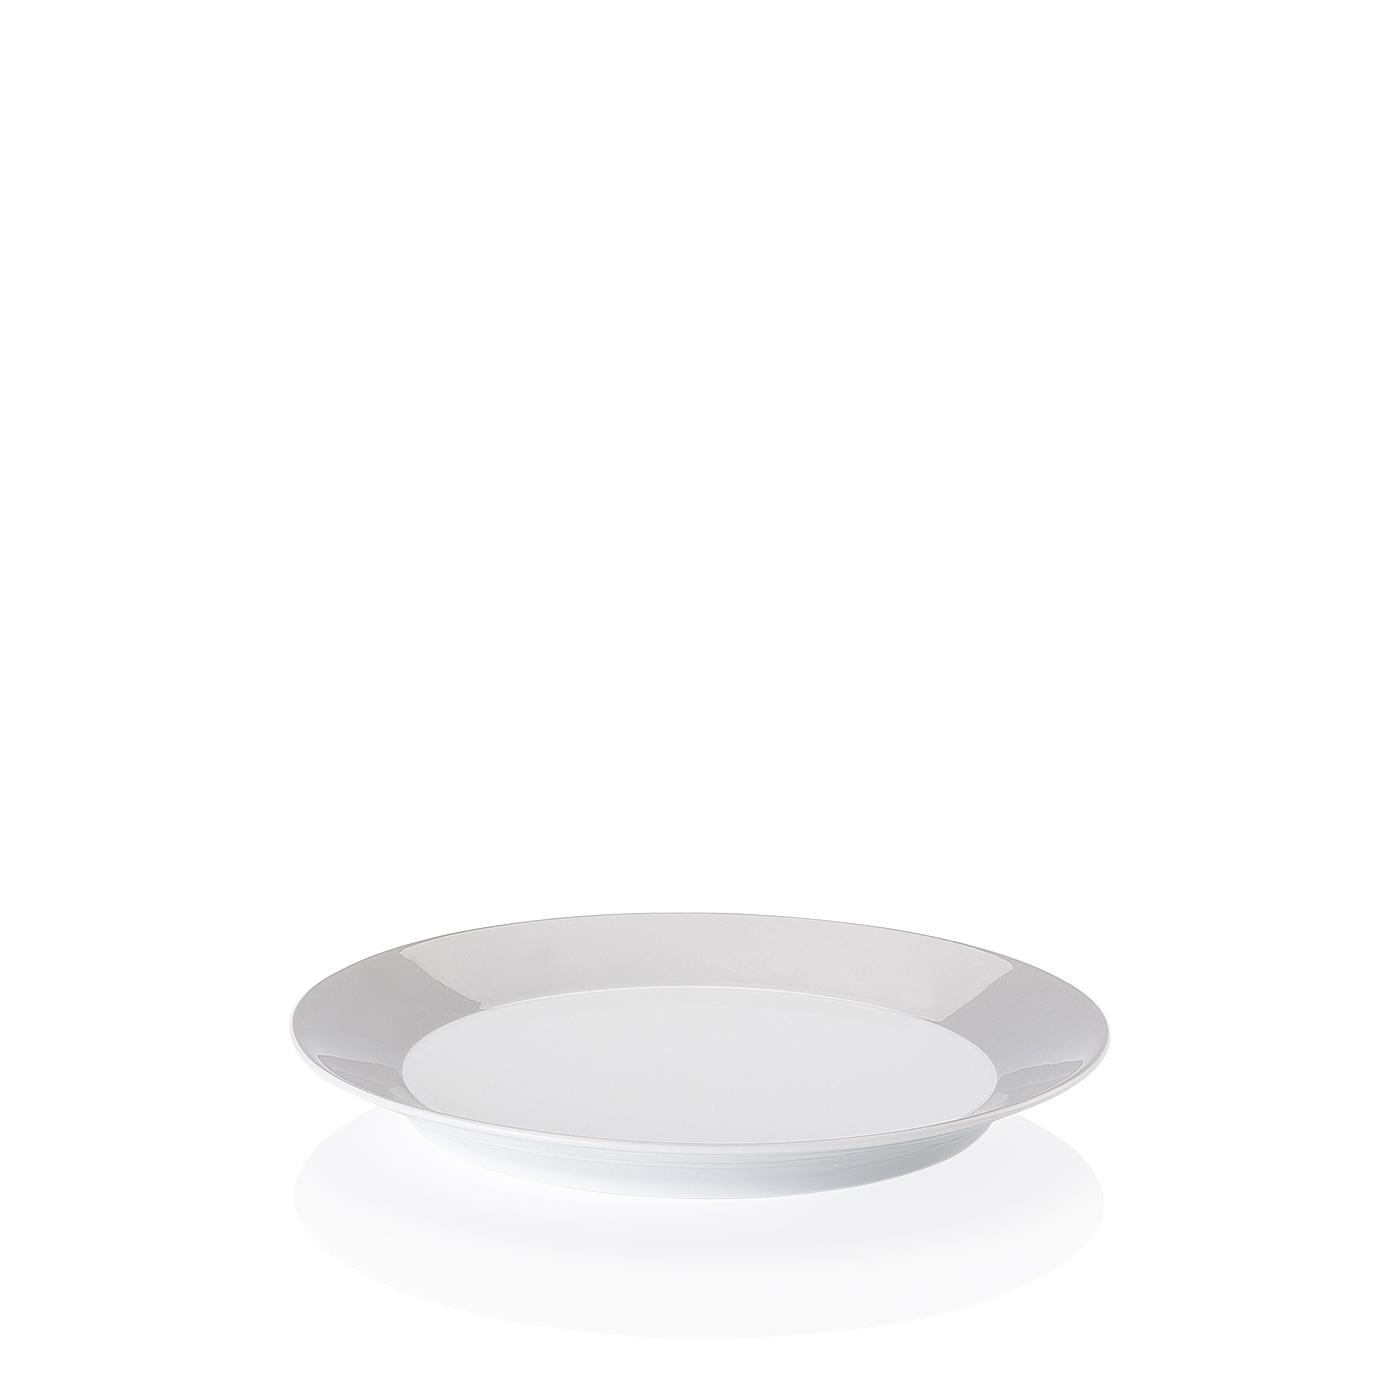 Frühstücksteller 22 cm/Fa Tric Cool Arzberg